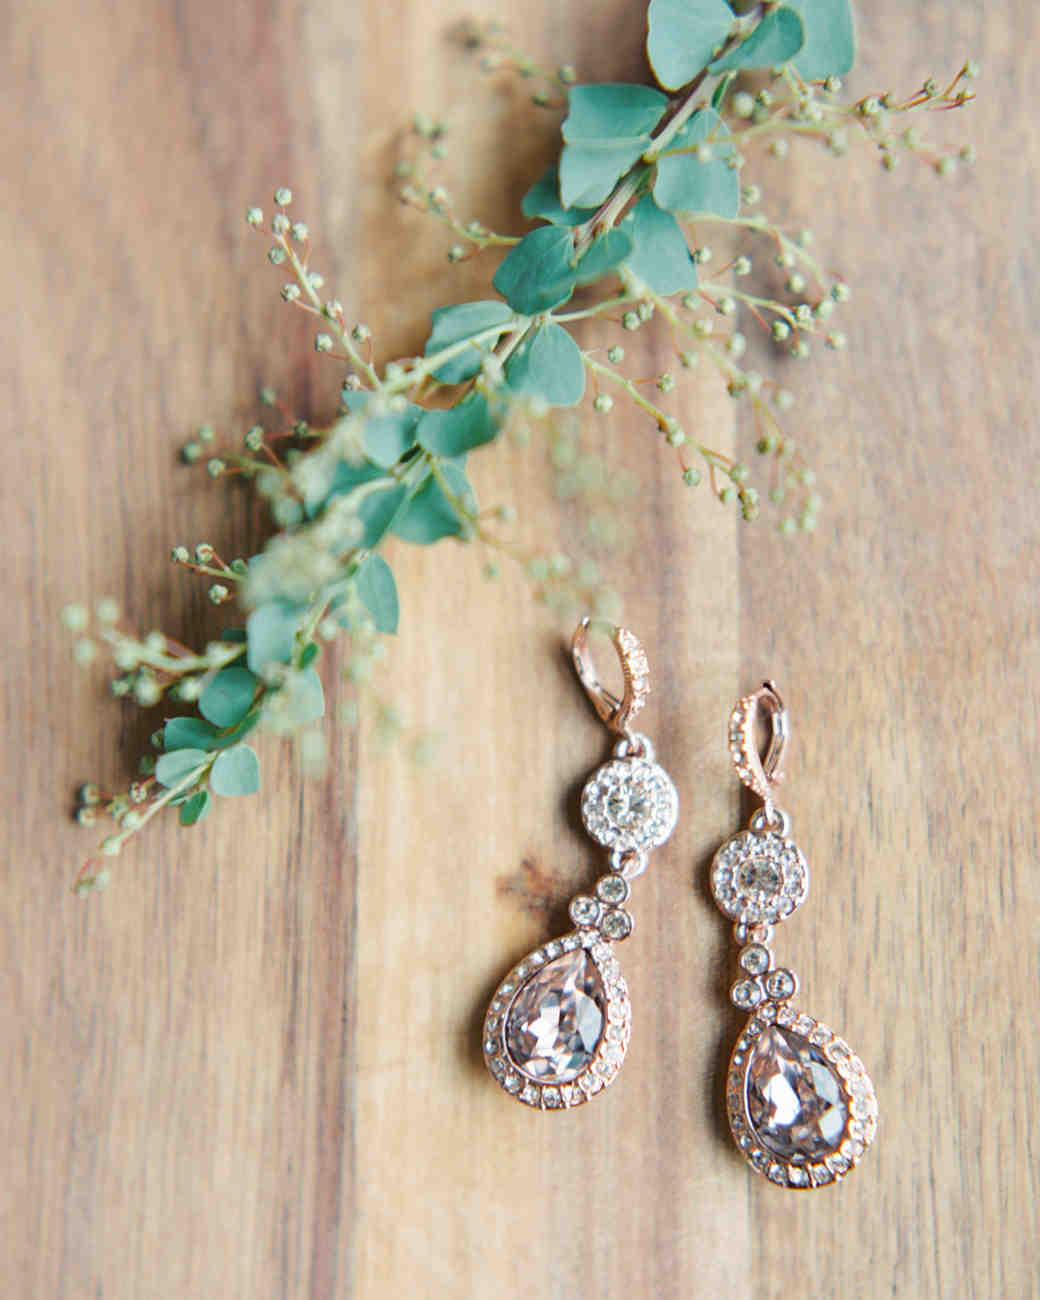 coleen-brandon-wedding-earrings-0614.jpg